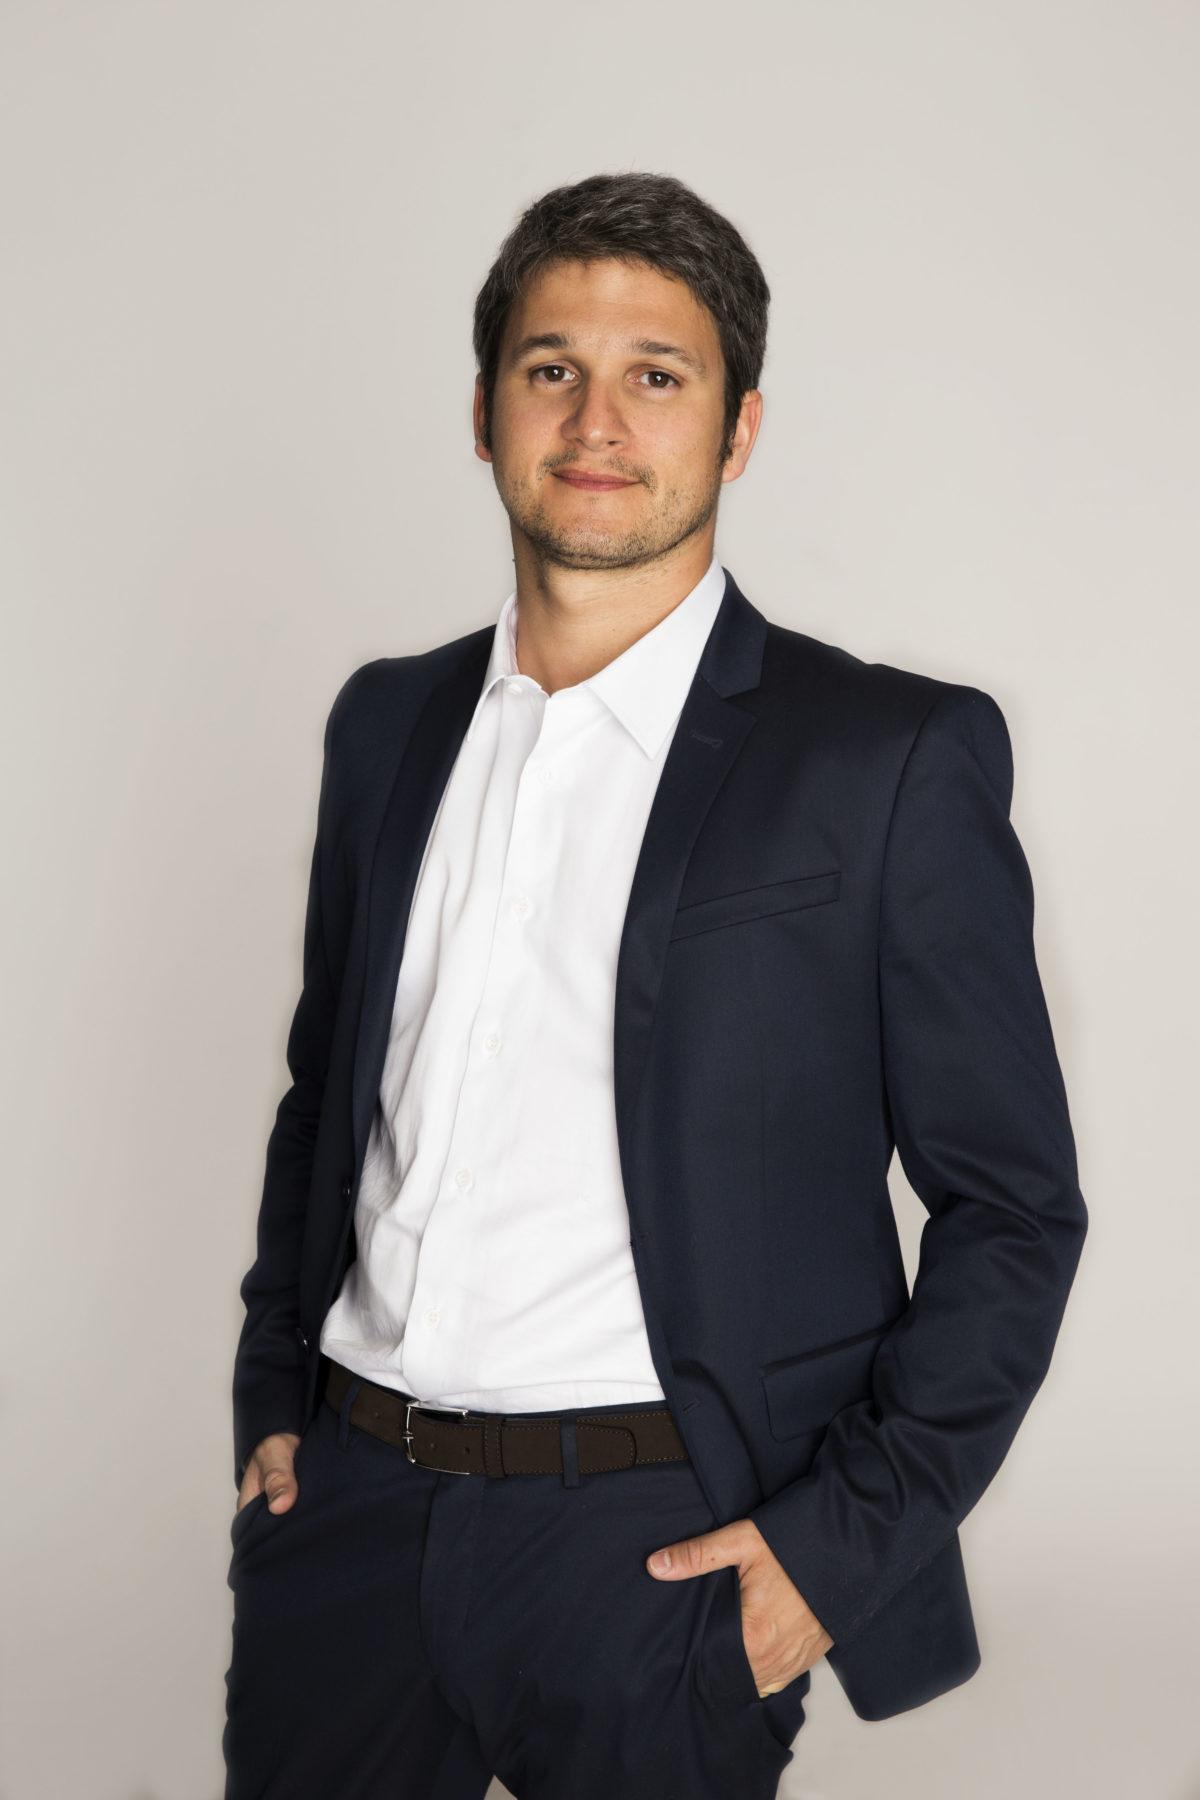 Luca Mazzucchelli